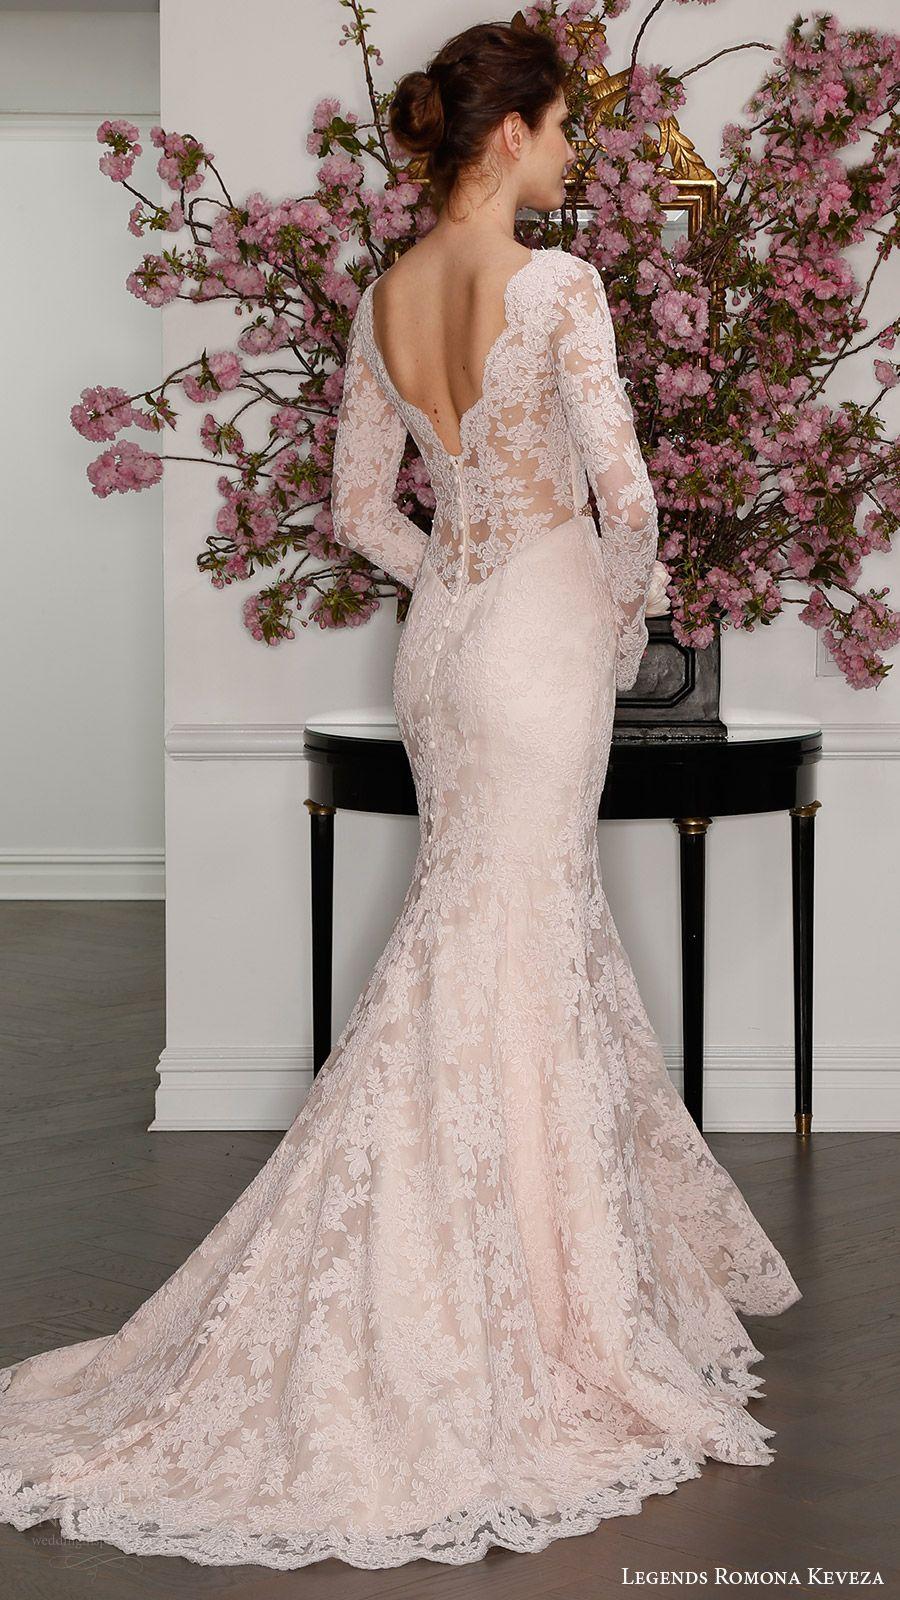 Legends romona keveza spring wedding dresses wedding dresses